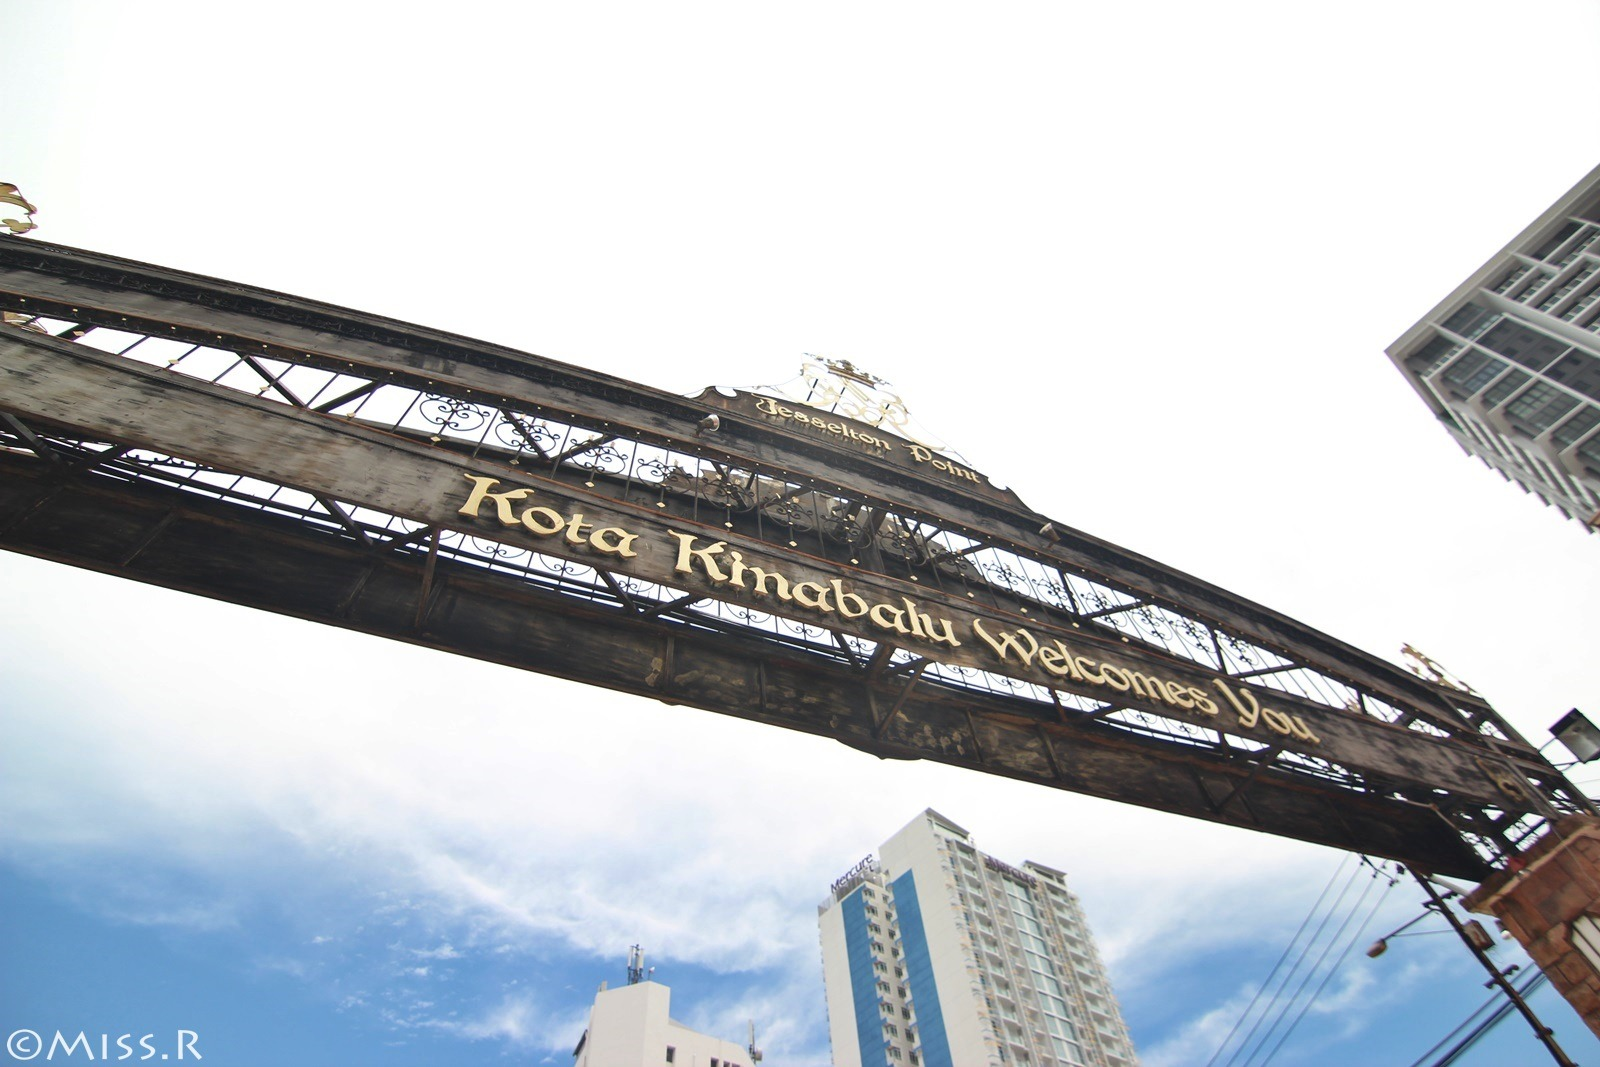 """沙巴自助,馬來西亞,馬來西亞自助,亞航沙巴,馬航沙巴,沙巴景點,klook,kkday,sabah,gayanamarineresort,hotelsixty3,globalwifi,wifi推薦,馬來西亞wifi,沙巴美食,Welcomeseafoodrestaurant,kotakinabalucitymosque水上清真寺,TanjungAruNightMarket"""